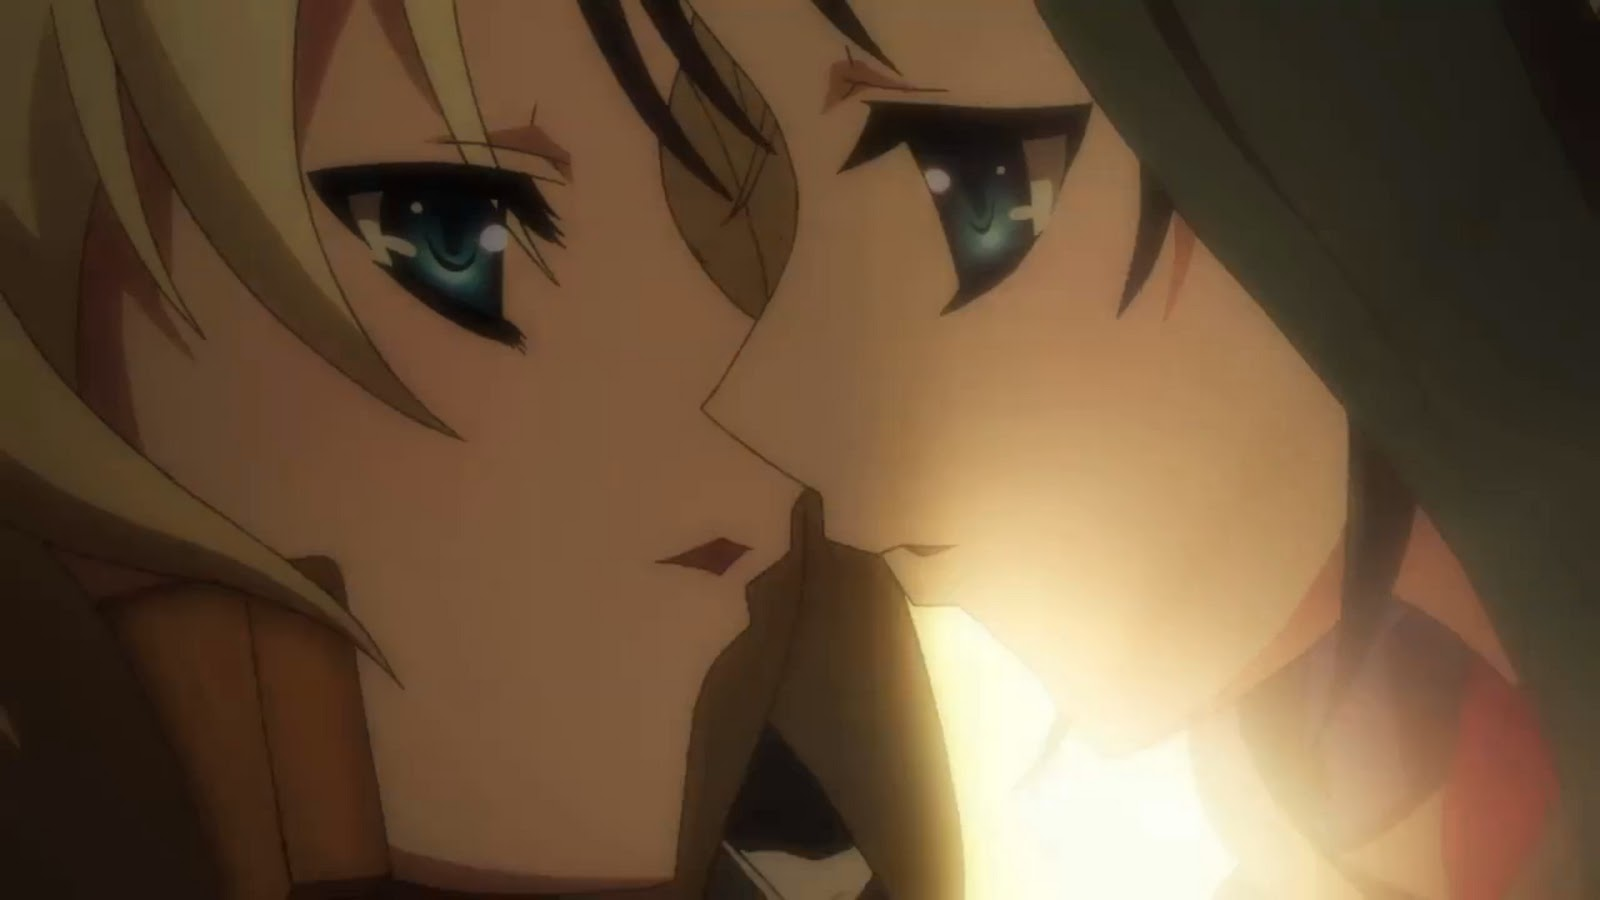 yuri no boke 百合のボケ 〜百合が好きだ〜: anime of interest to yuri